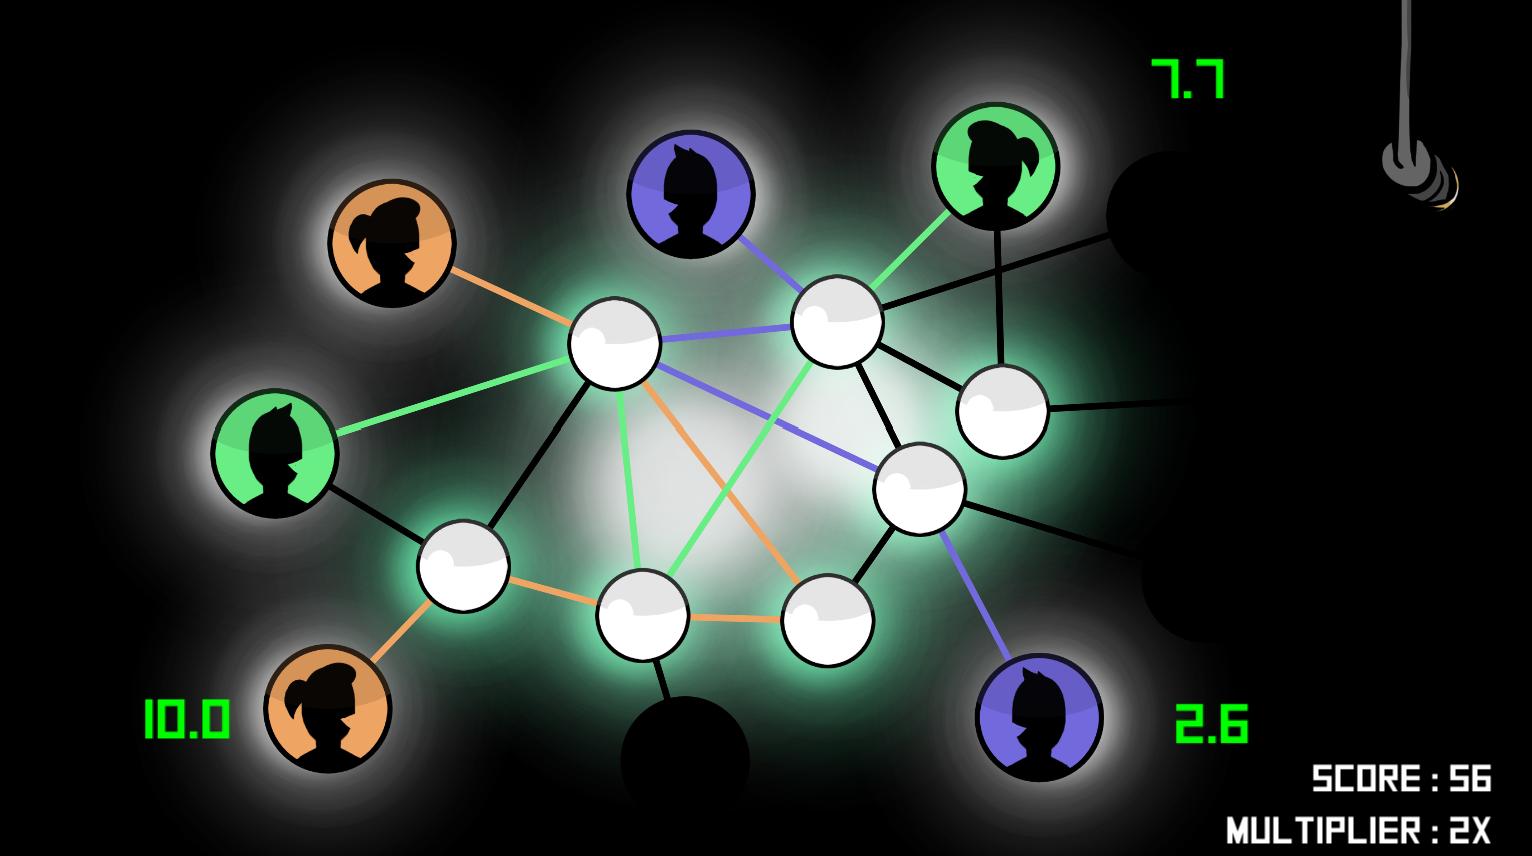 IMAGE(http://brandygonz12.alwaysdata.net/limited_connection/Capture8.PNG)